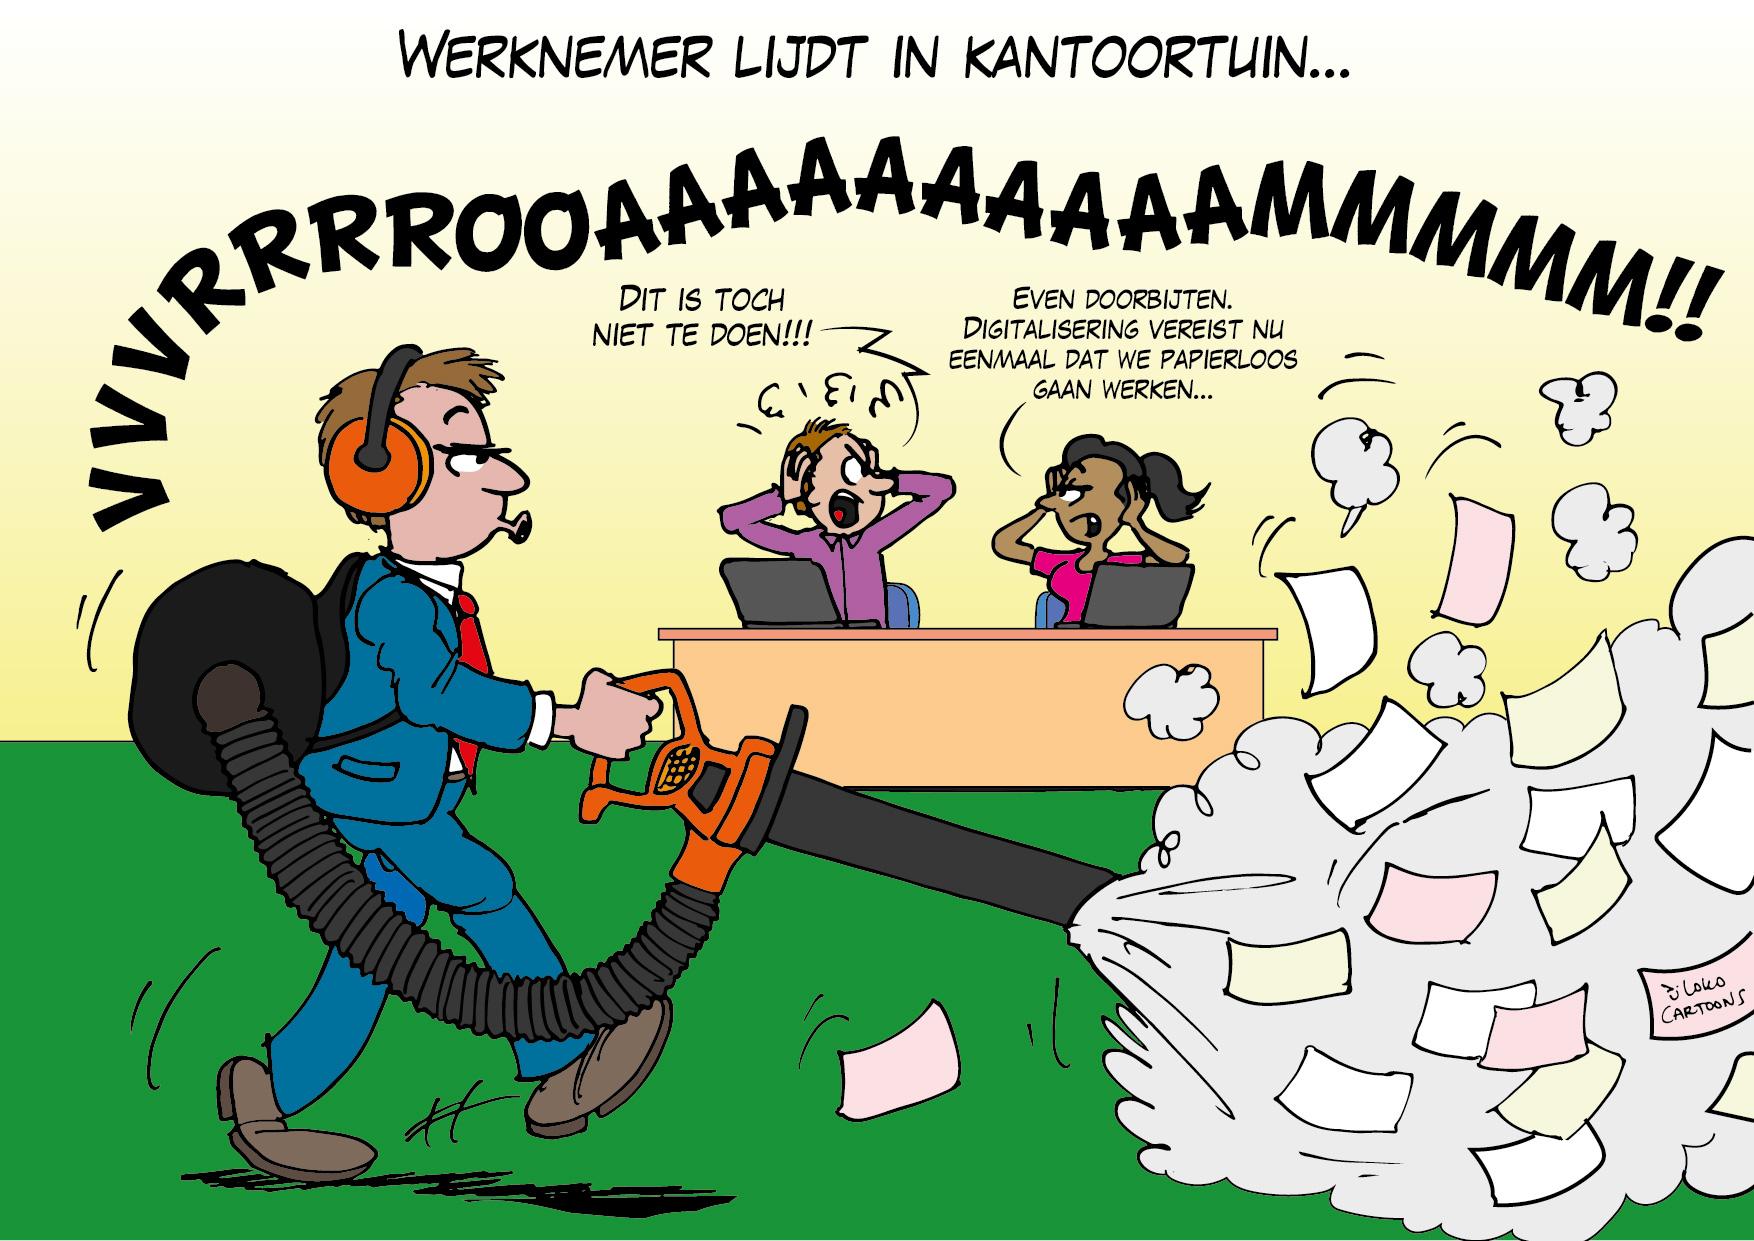 Werknemer lijdt in kantoortuin…